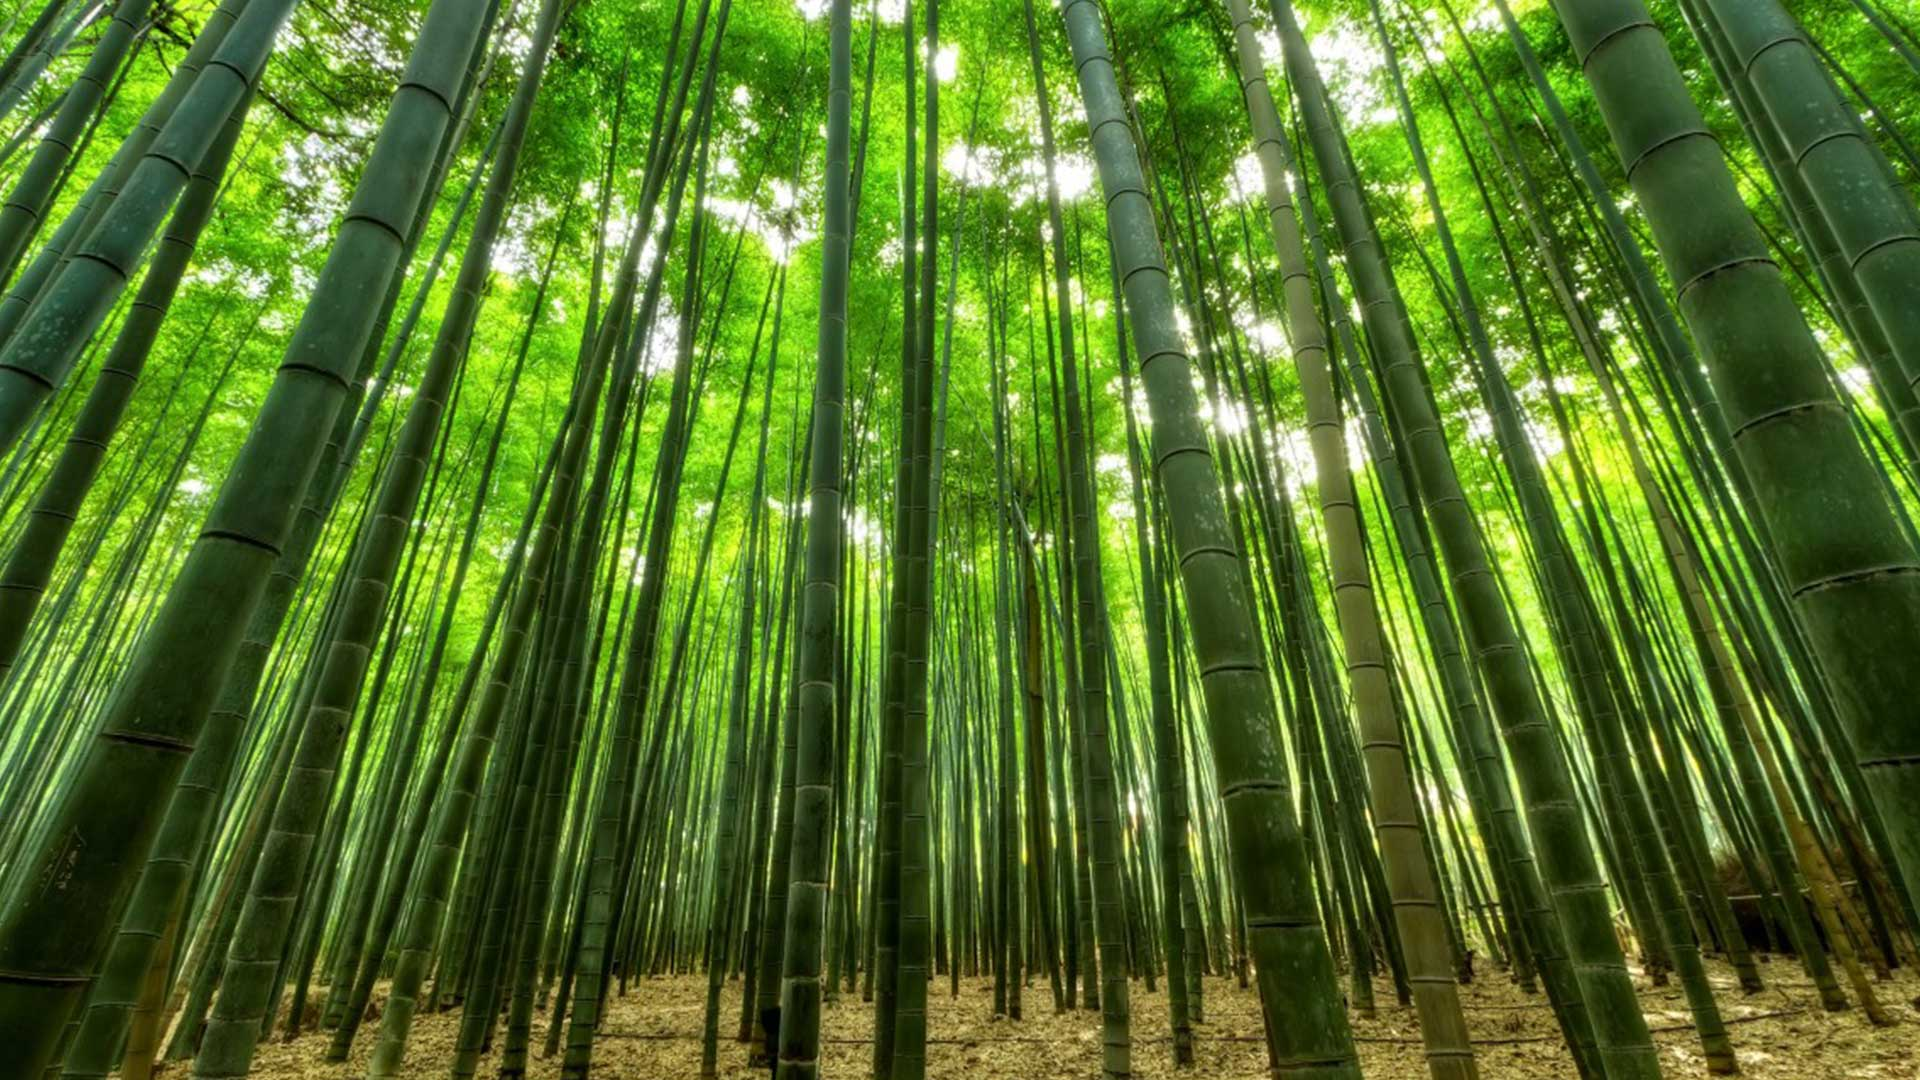 Toilettenpapier aus Bambus hat Vor- aber auch einige Nachteile. CC0 Public Domain